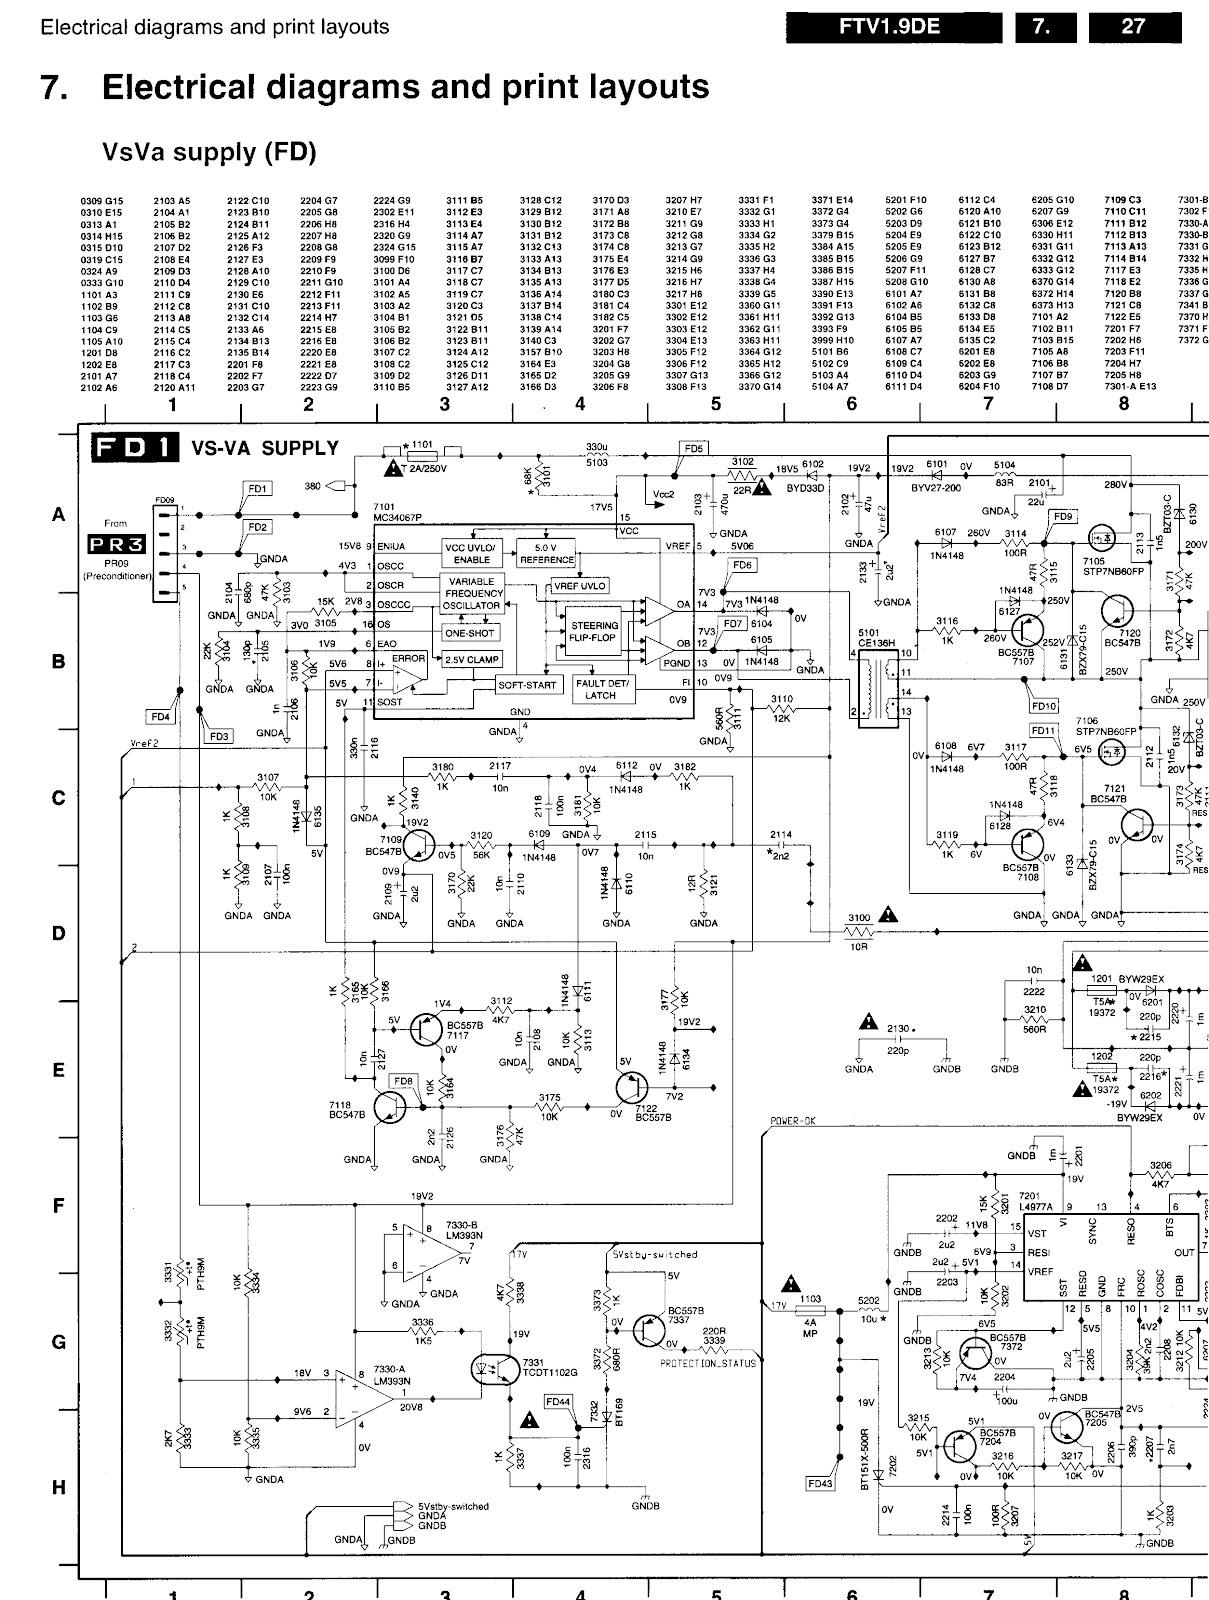 Electro help: PHILIPS - FTV-19 _ PLASMA _ POWER SUPPLY ...